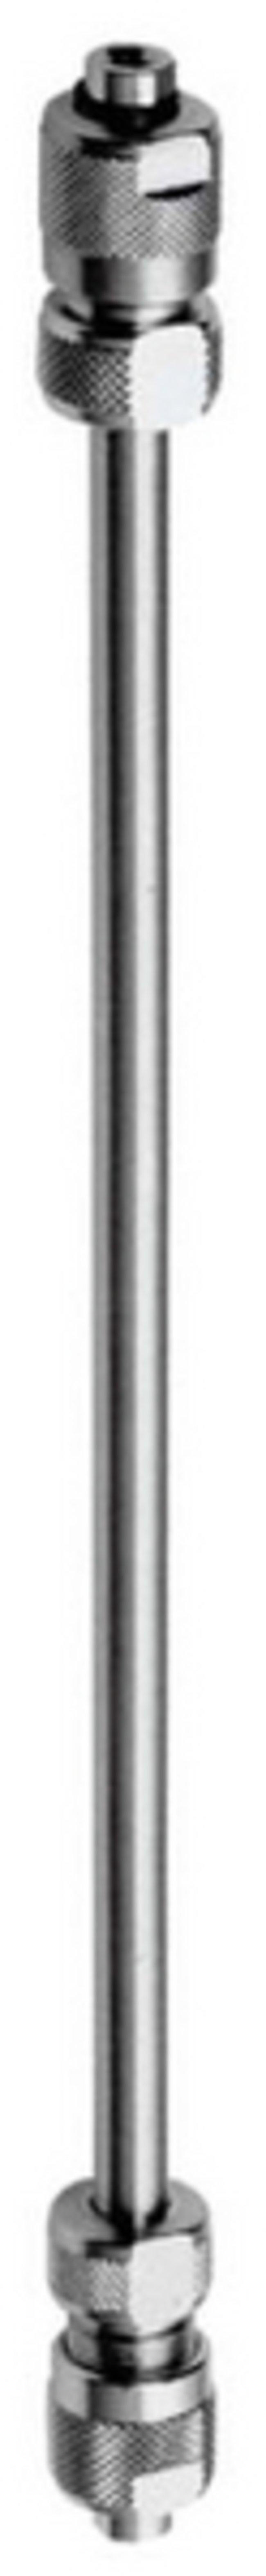 MilliporeSigma&trade;&nbsp;LiChroCART&trade; Column/LiChrospher&trade; 100 NH<sub>2</sub> Sorbent HPLC Cartridges, 5&mu;m